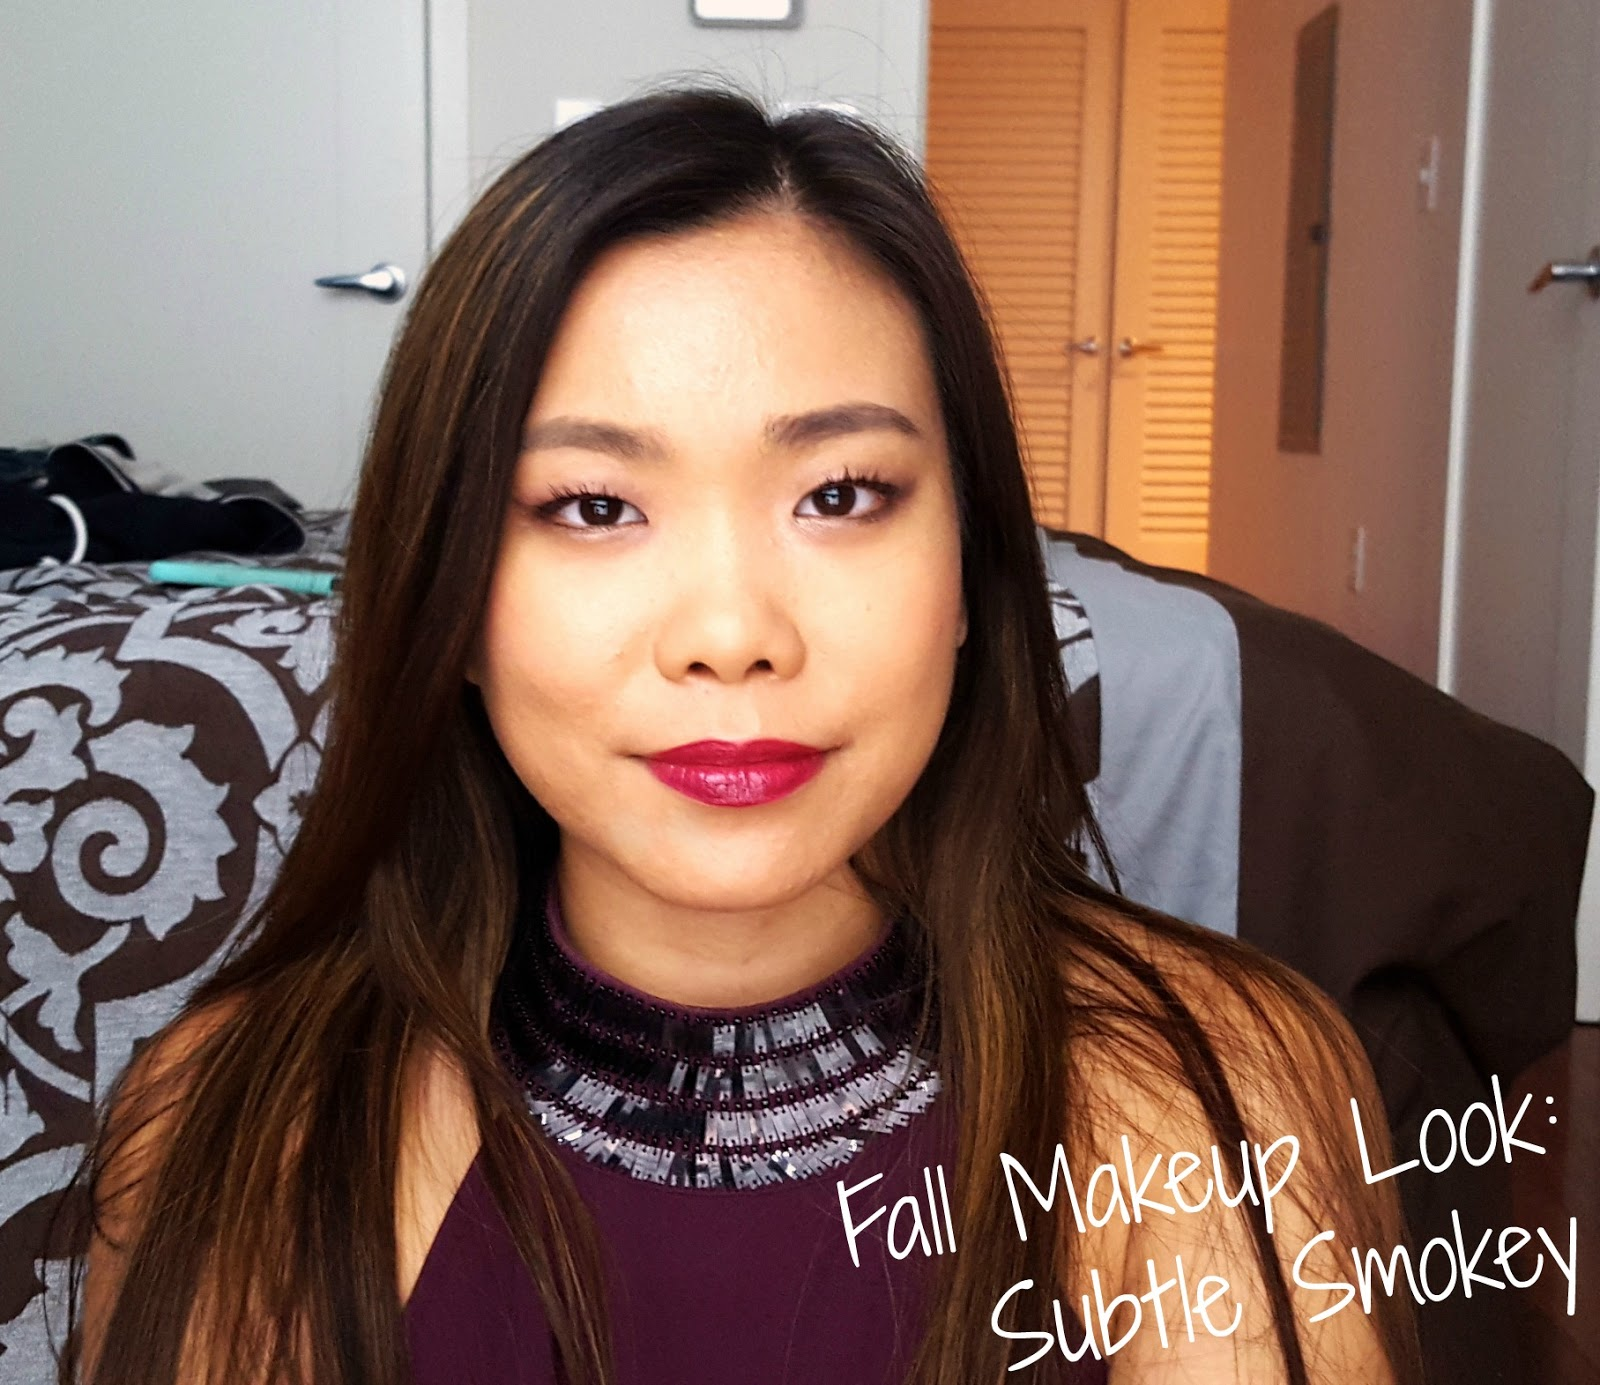 Fall Makeup Tutorial Subtle Smokey La Vie En May Petite